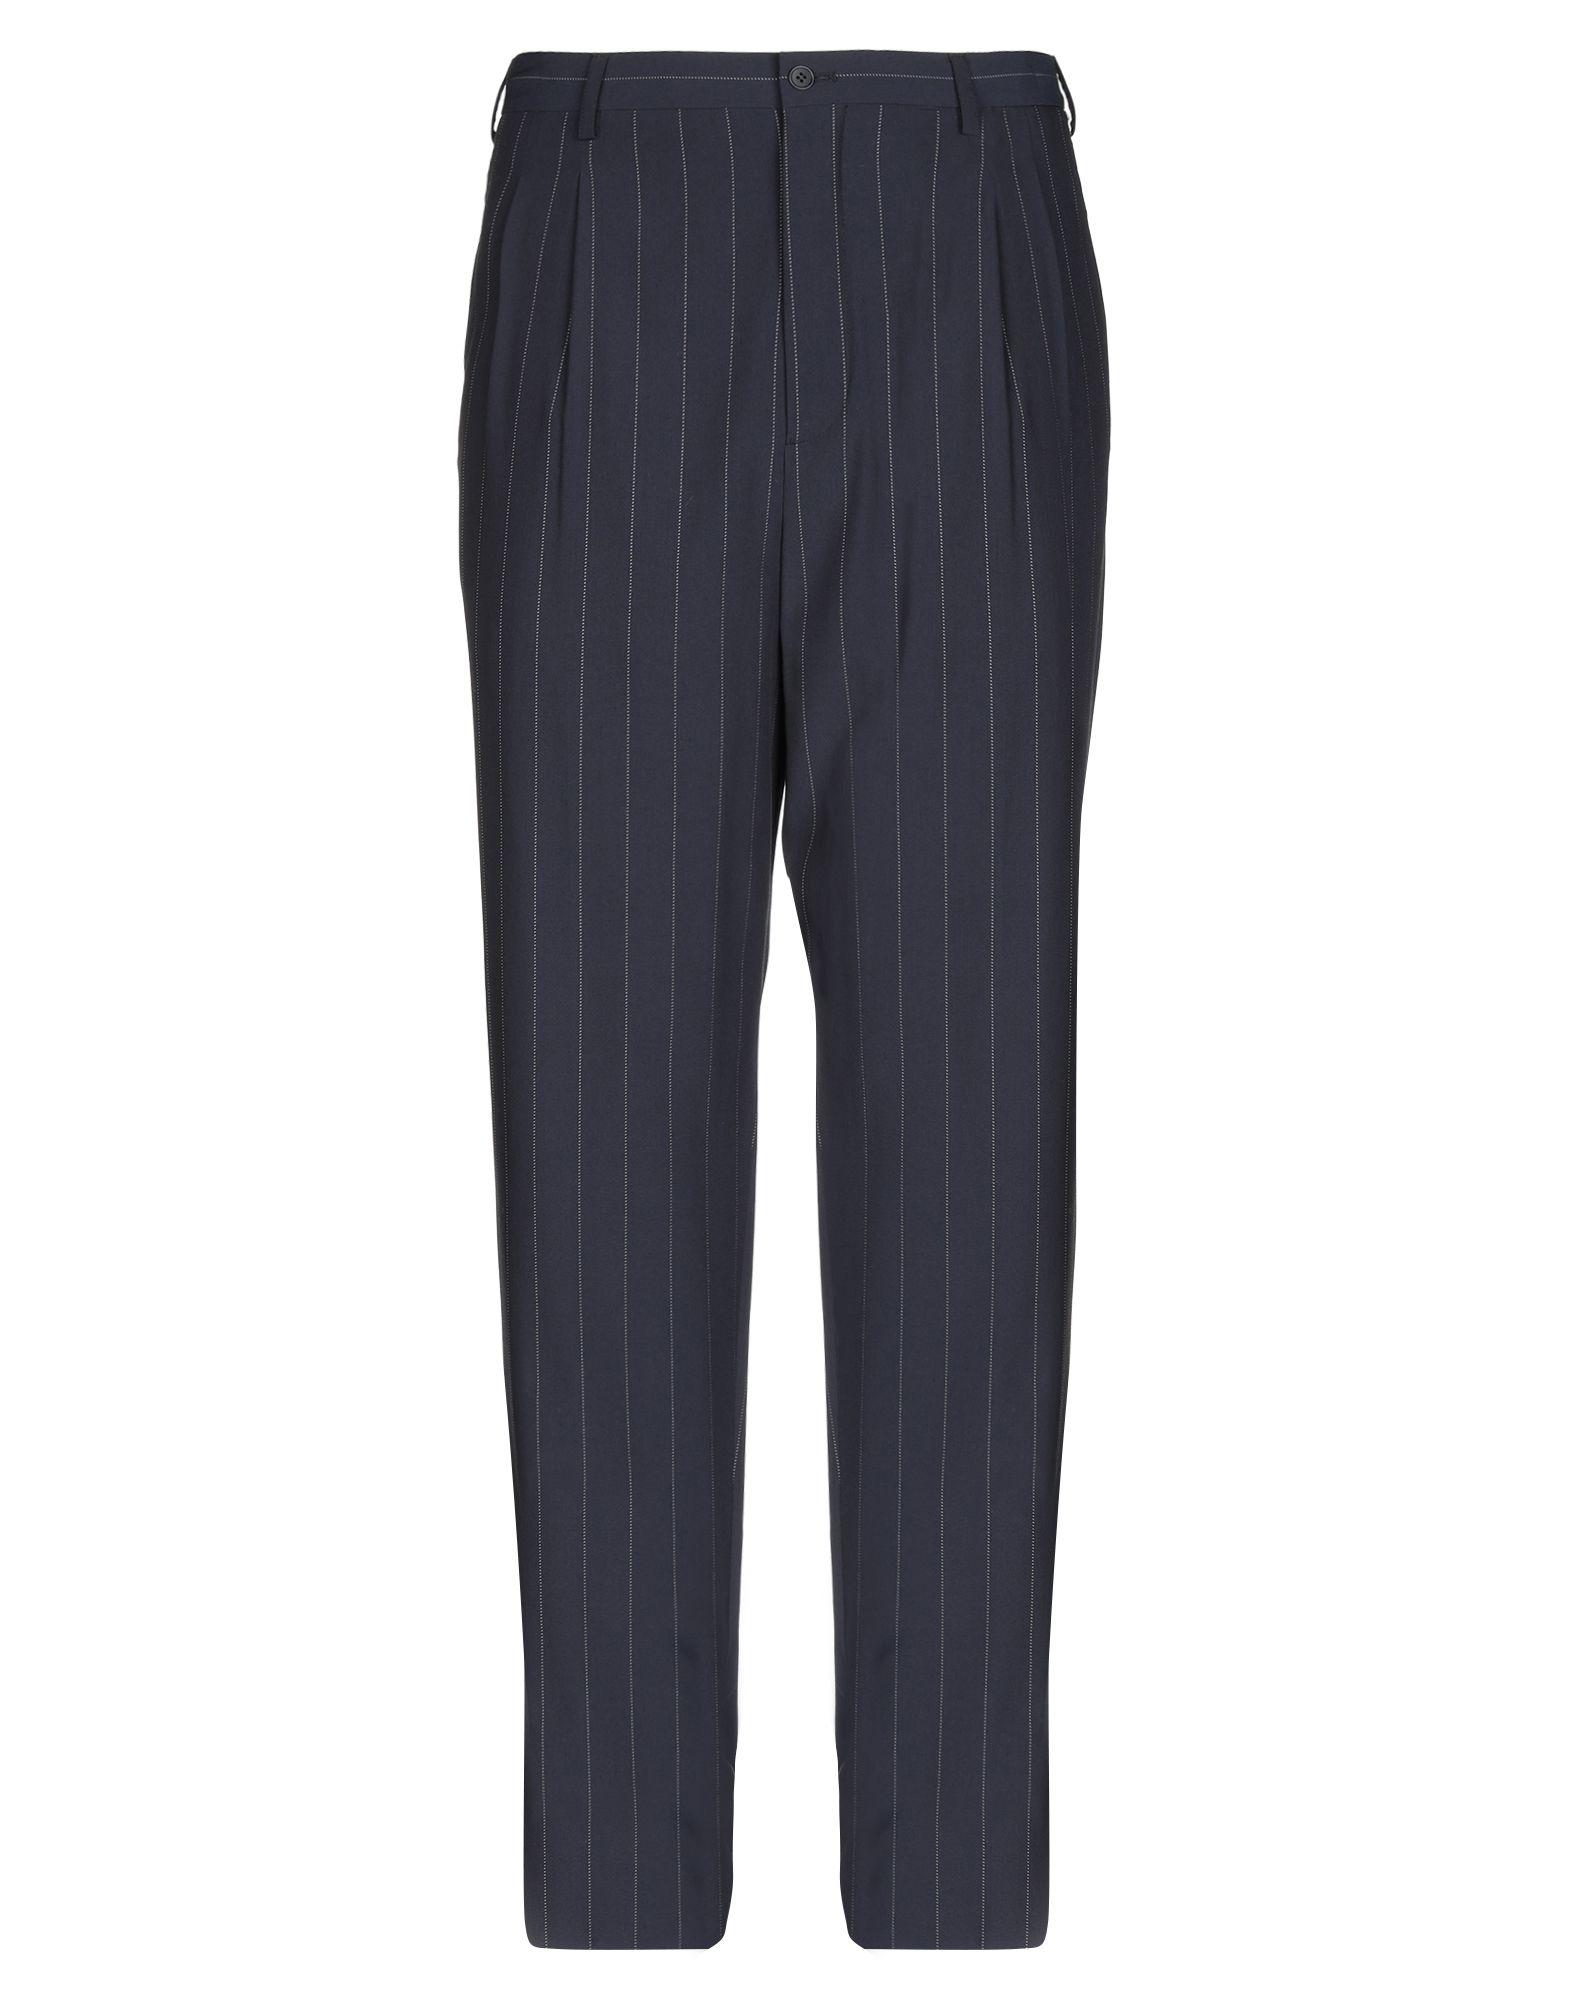 GIORGIO ARMANI Повседневные брюки giorgio armani сапоги в стиле чулок стрейч